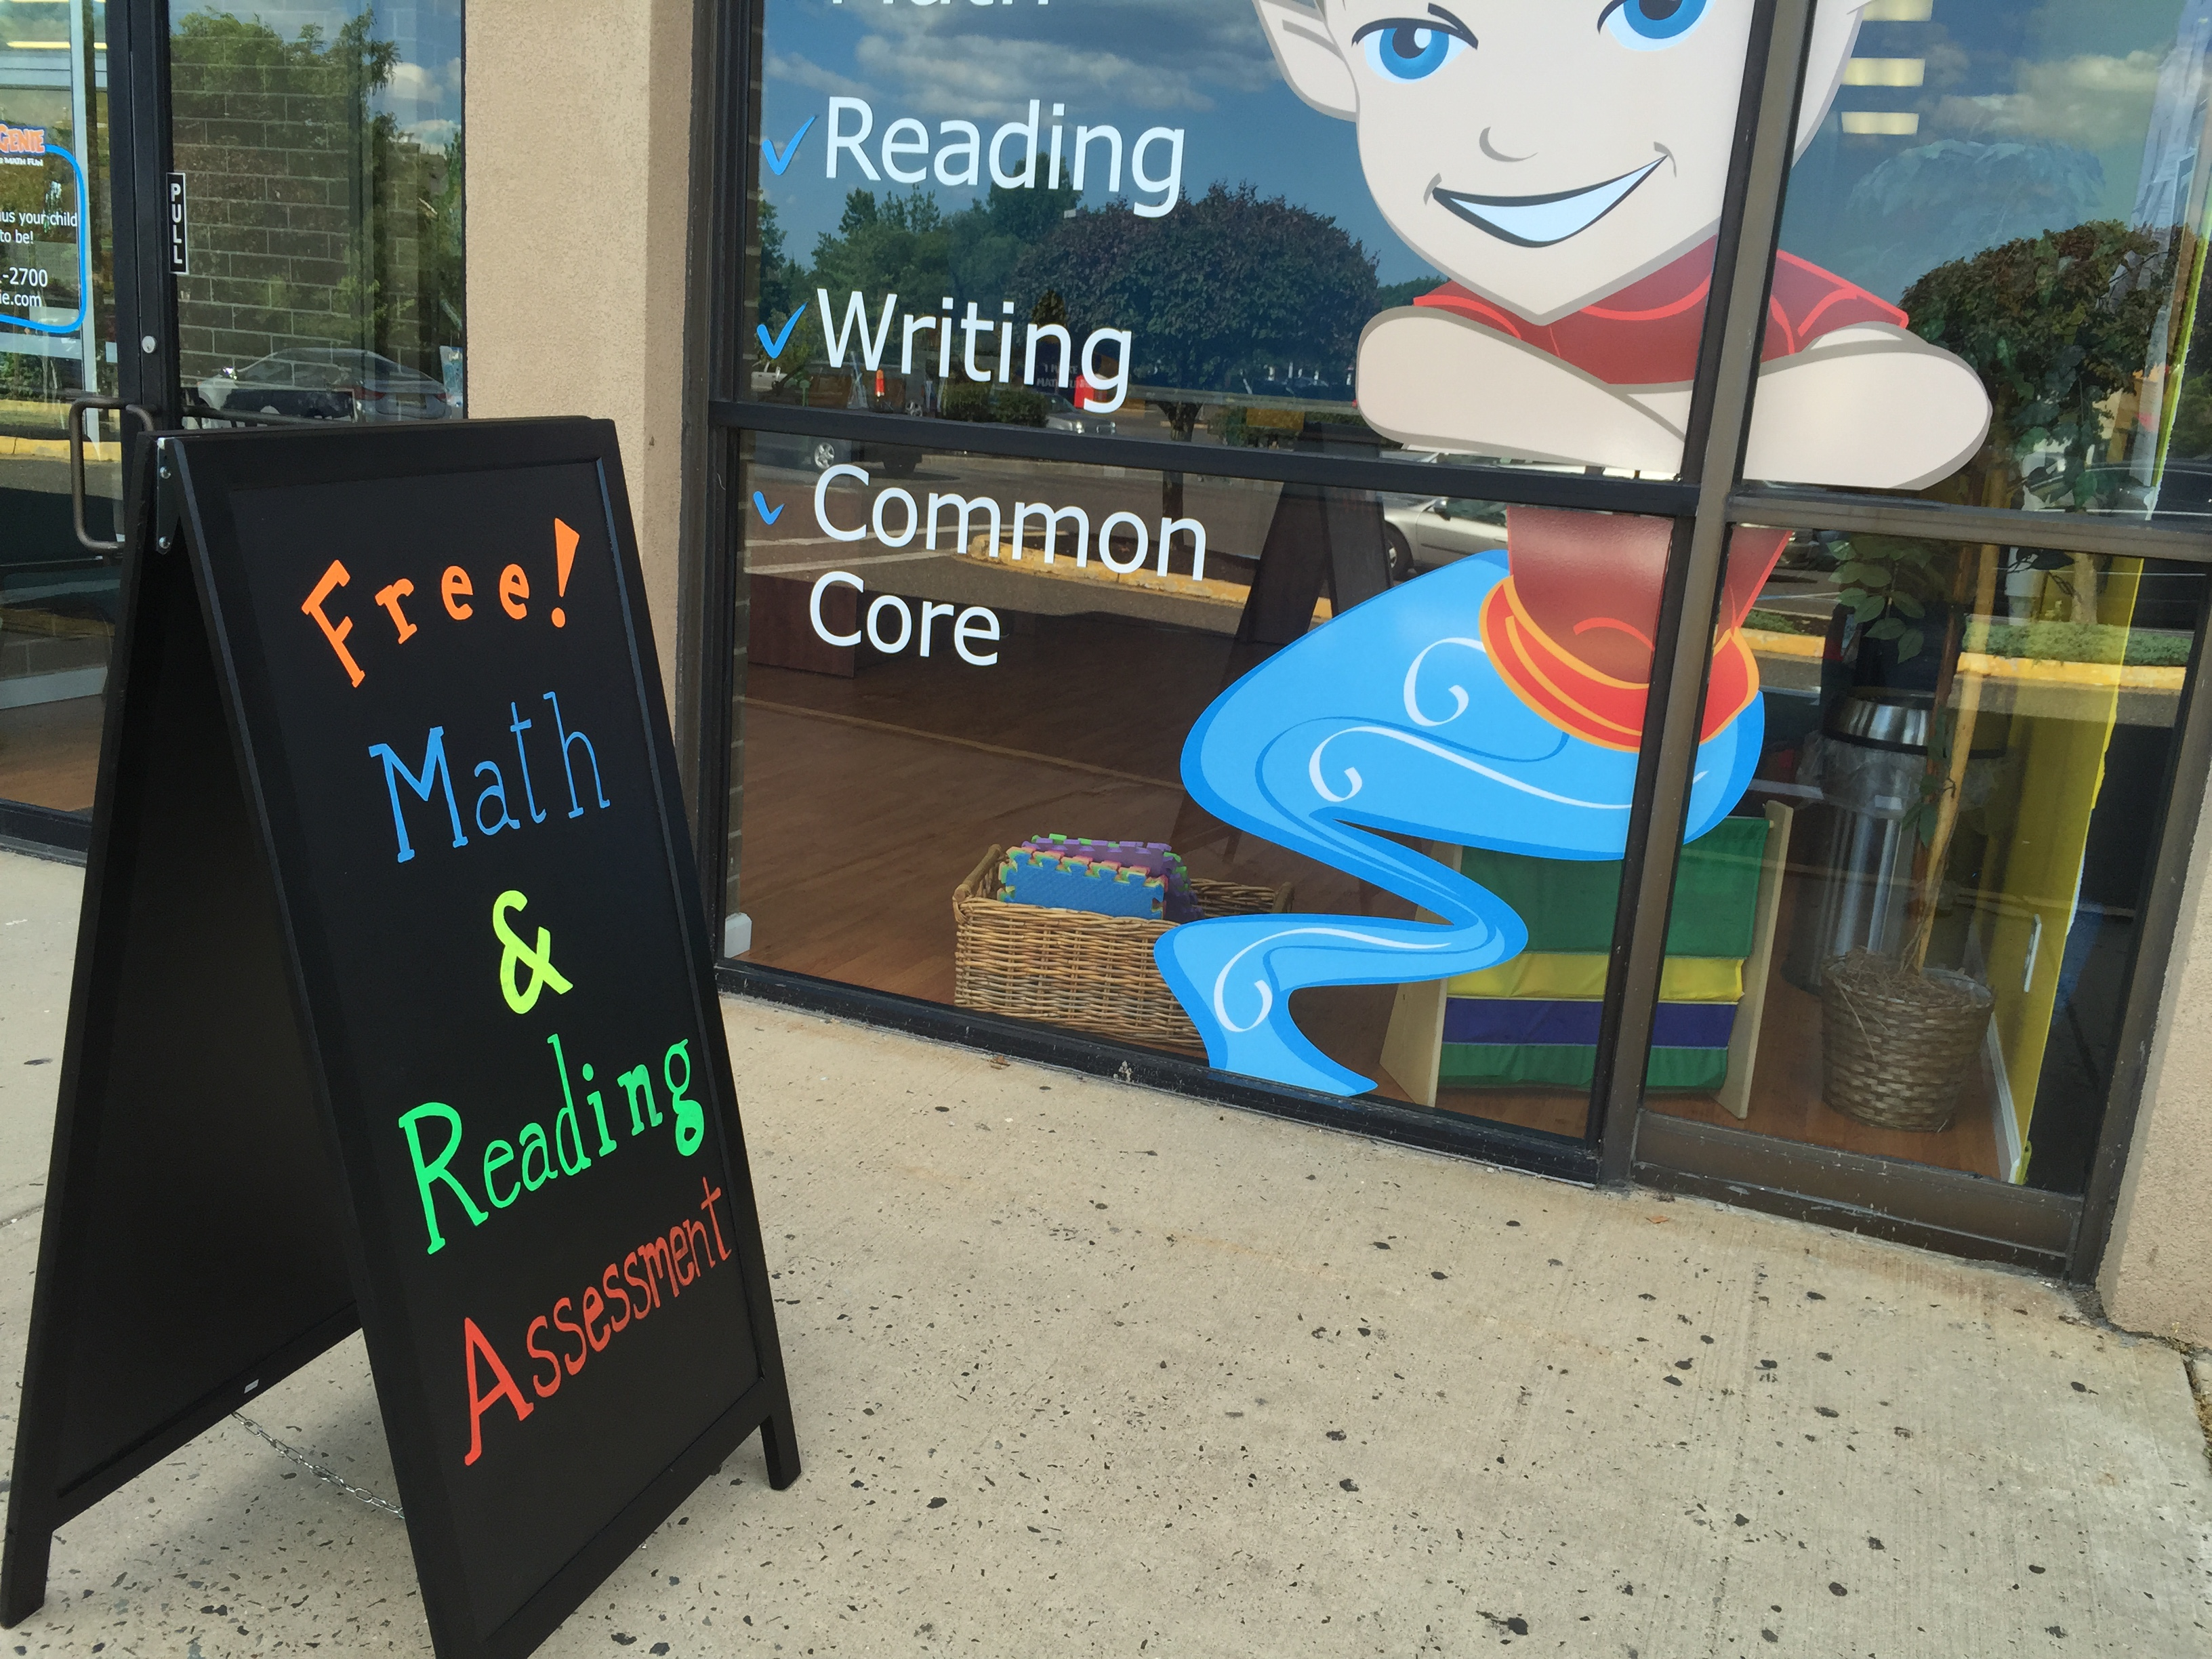 Math Genie East Brunswick Free Math and Reading Assessments